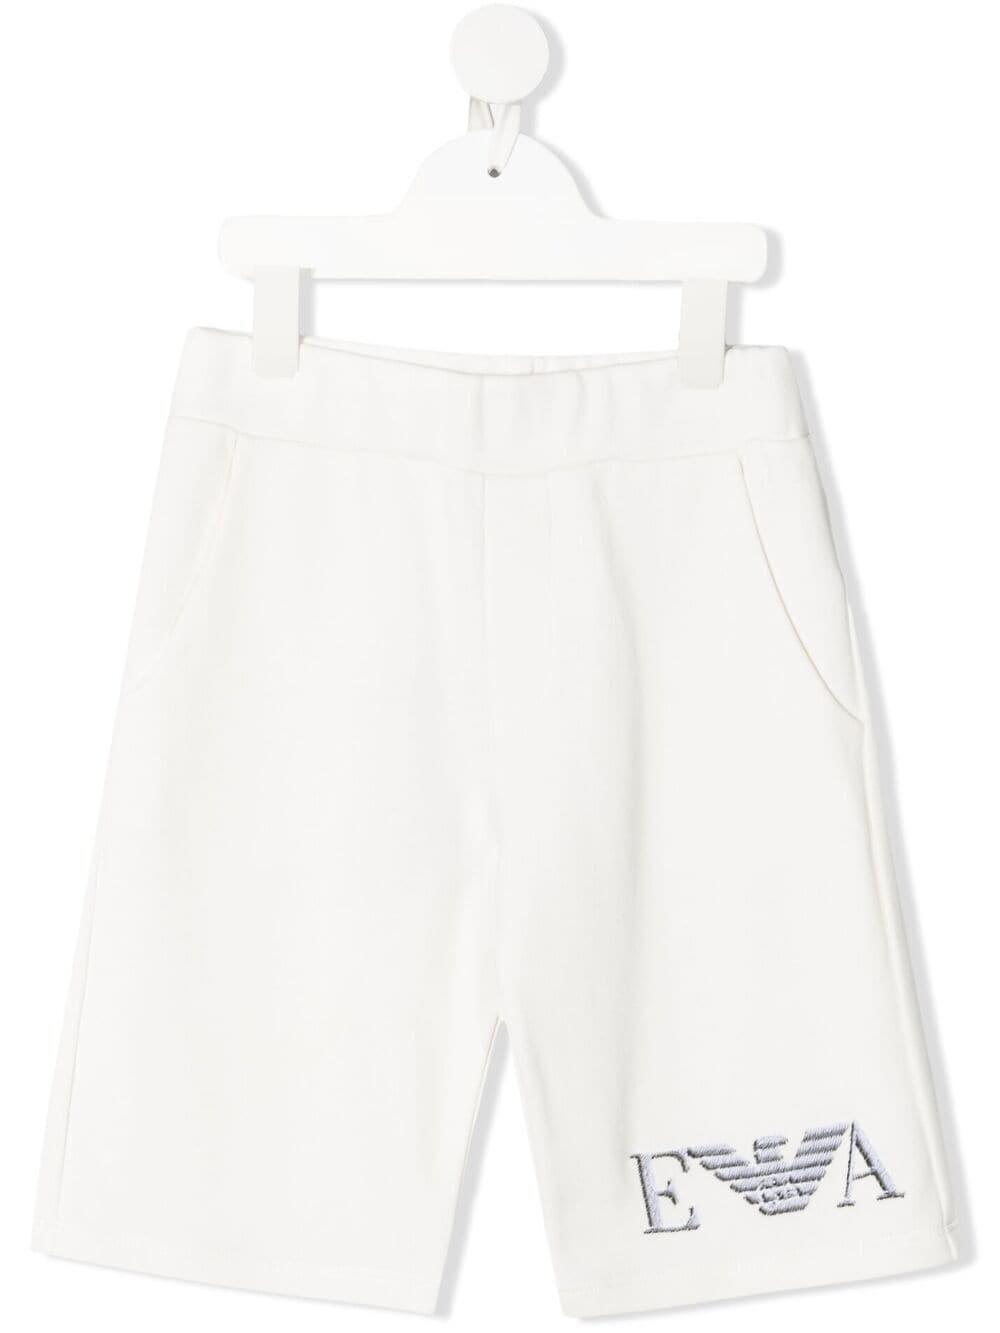 GIORGIO ARMANI KIDS | Shorts | 3K4SP51JTNZ0101#